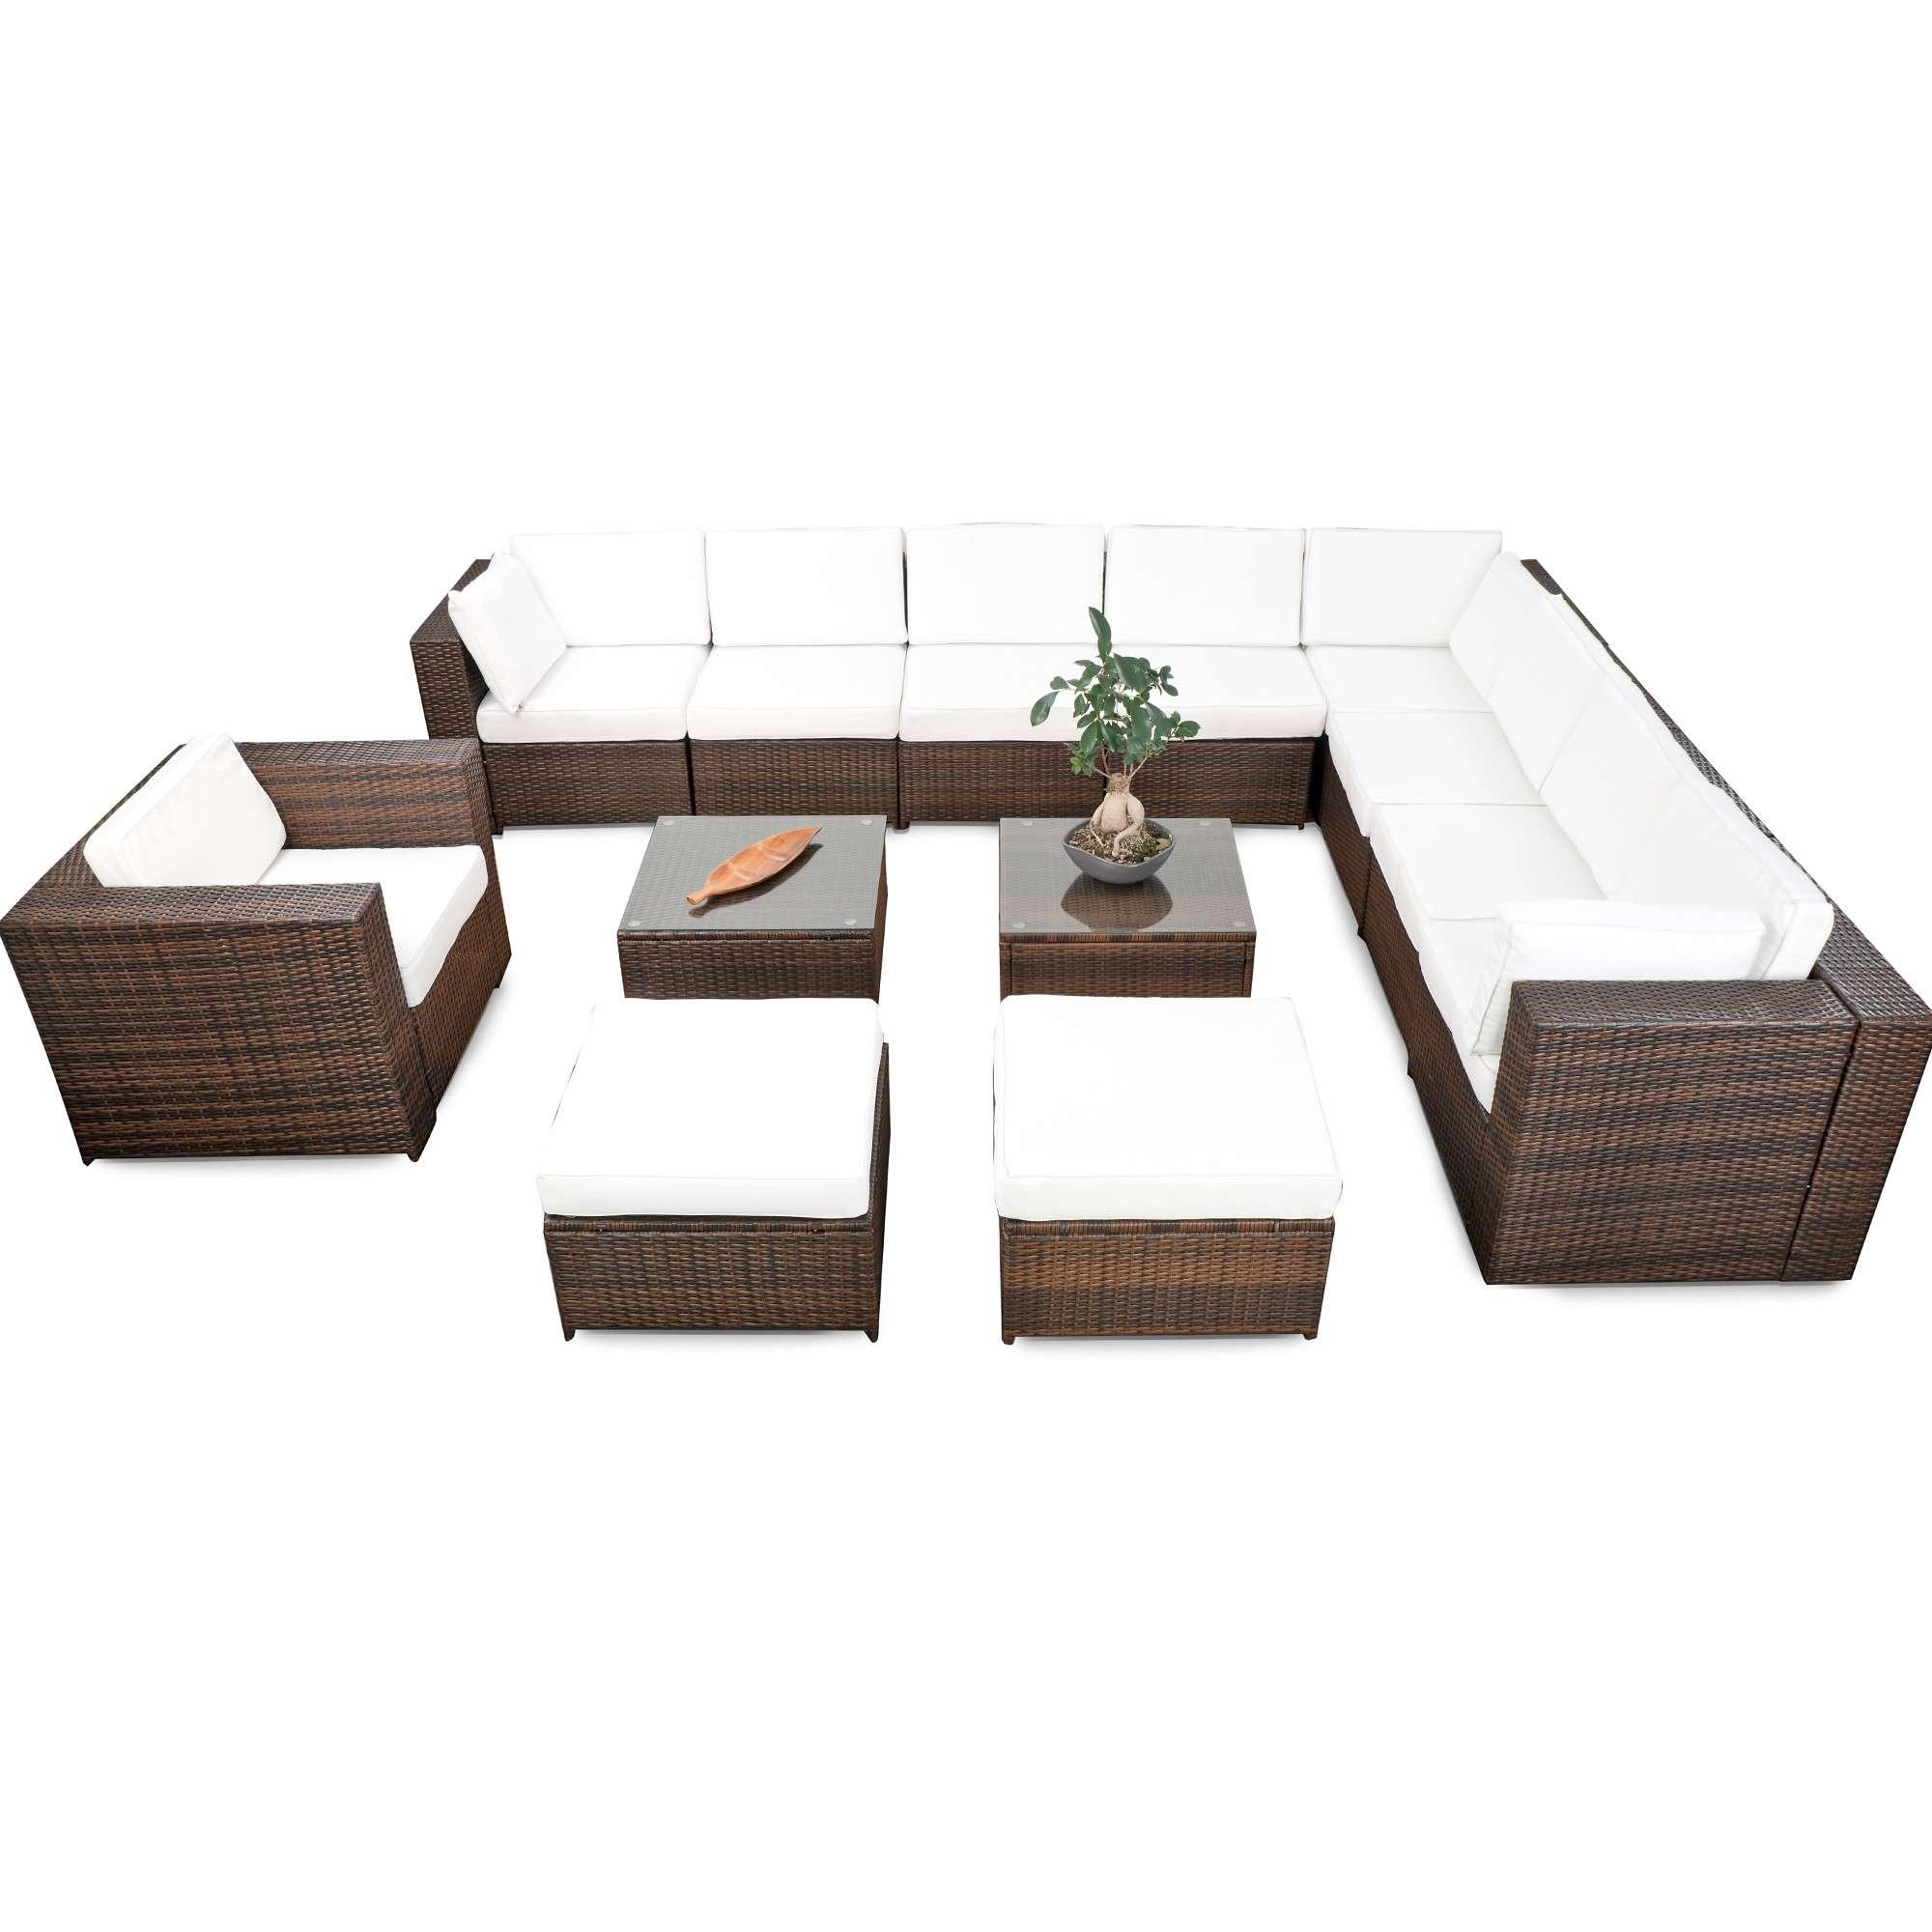 Elegant Gartenmöbel 3 Teilig Ideen